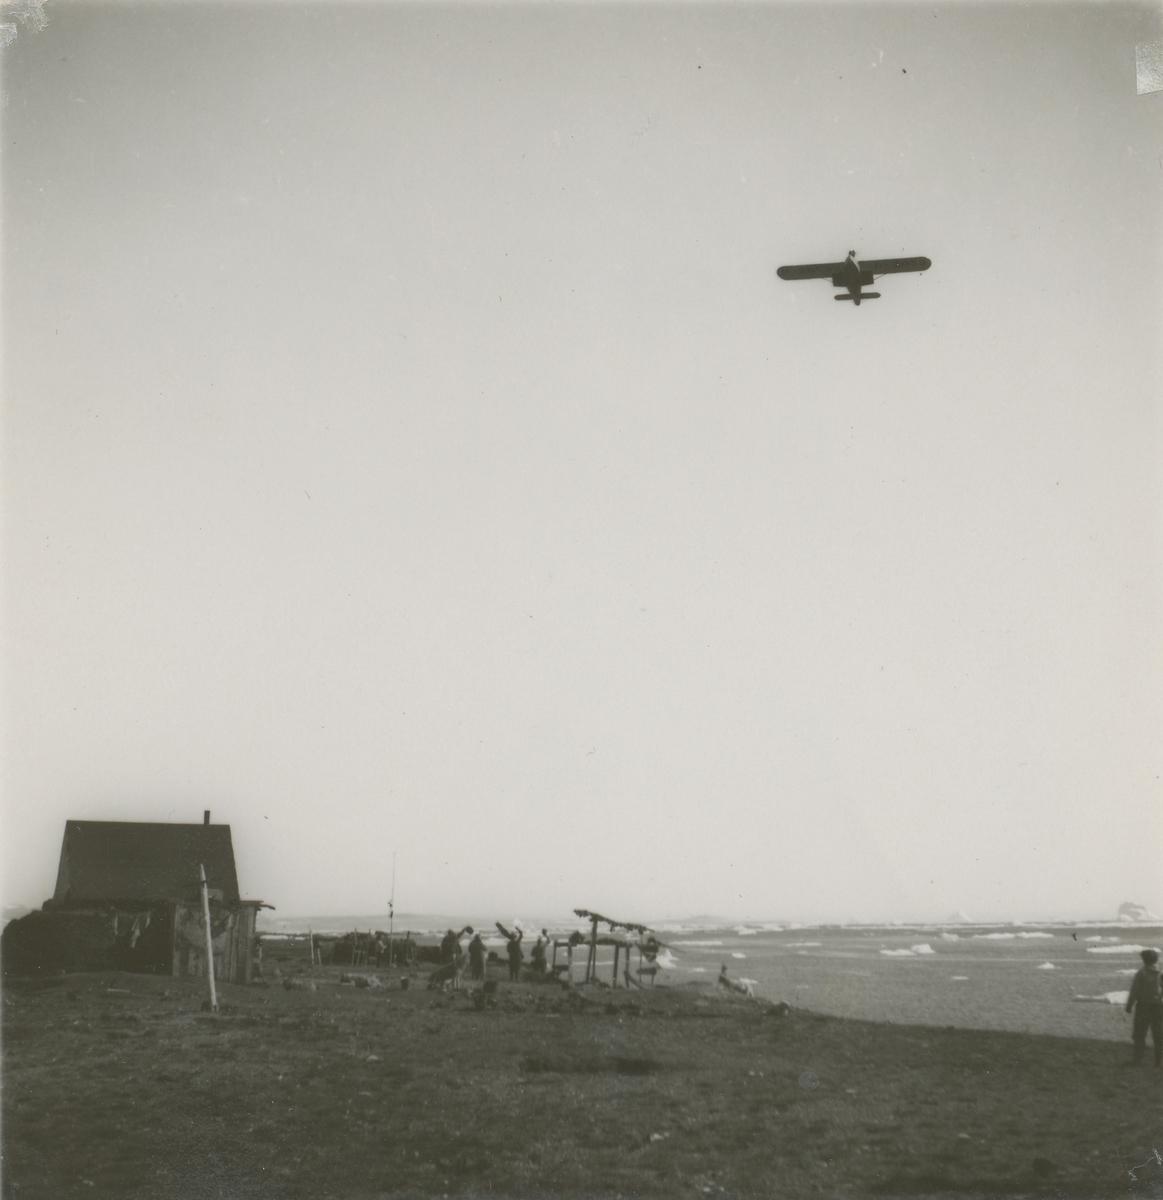 Wolfgang Von Gronau flyr over Kap Hope i Øst-Grønland. En gruppe mennesker står på bakken og vinker til flyet.